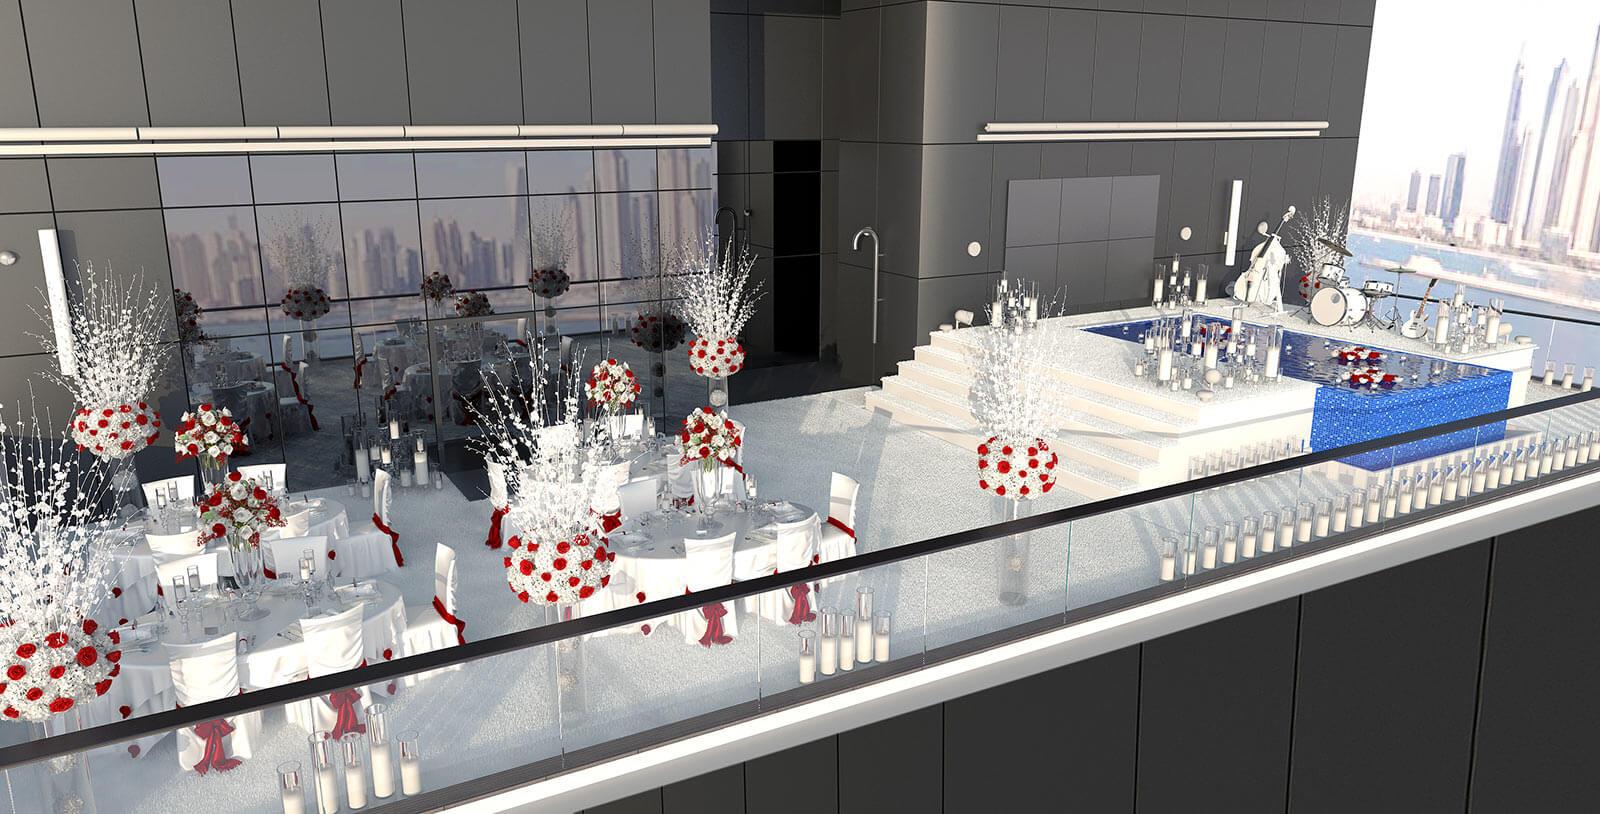 3D Visualisation of penthouse in Dubai, 3D modeling,  3d event design, London, UK.